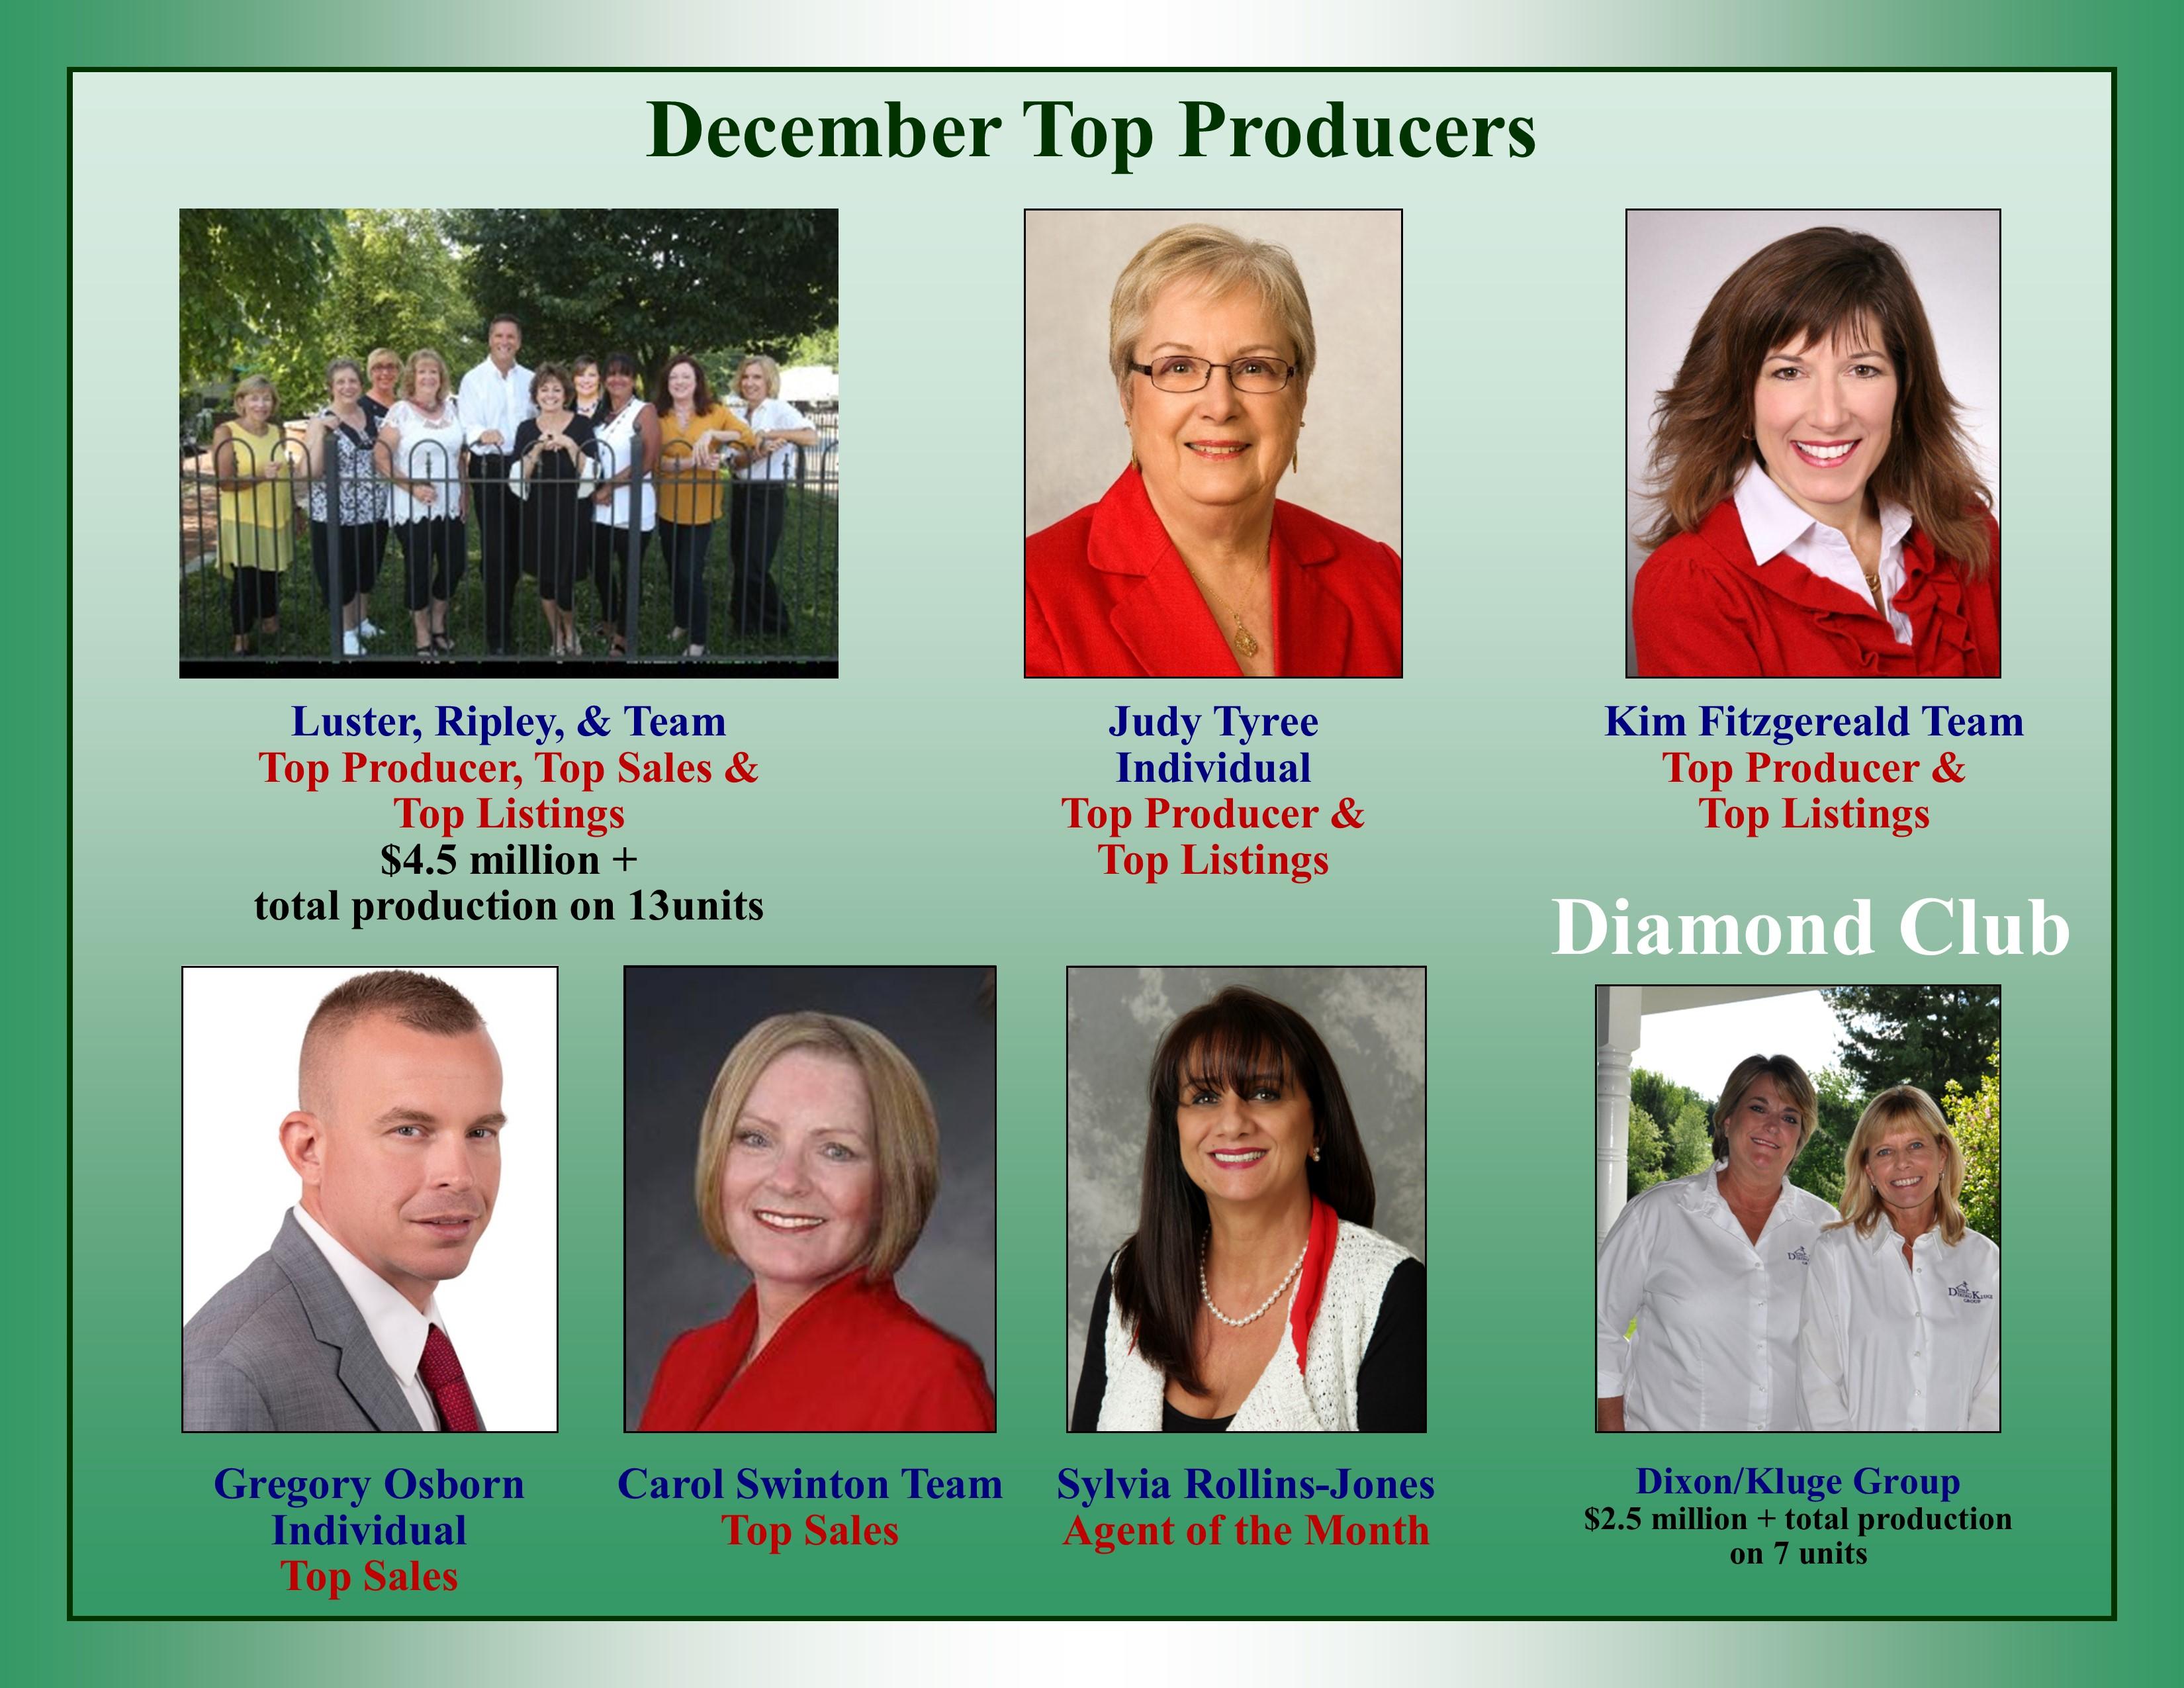 December Top Producers